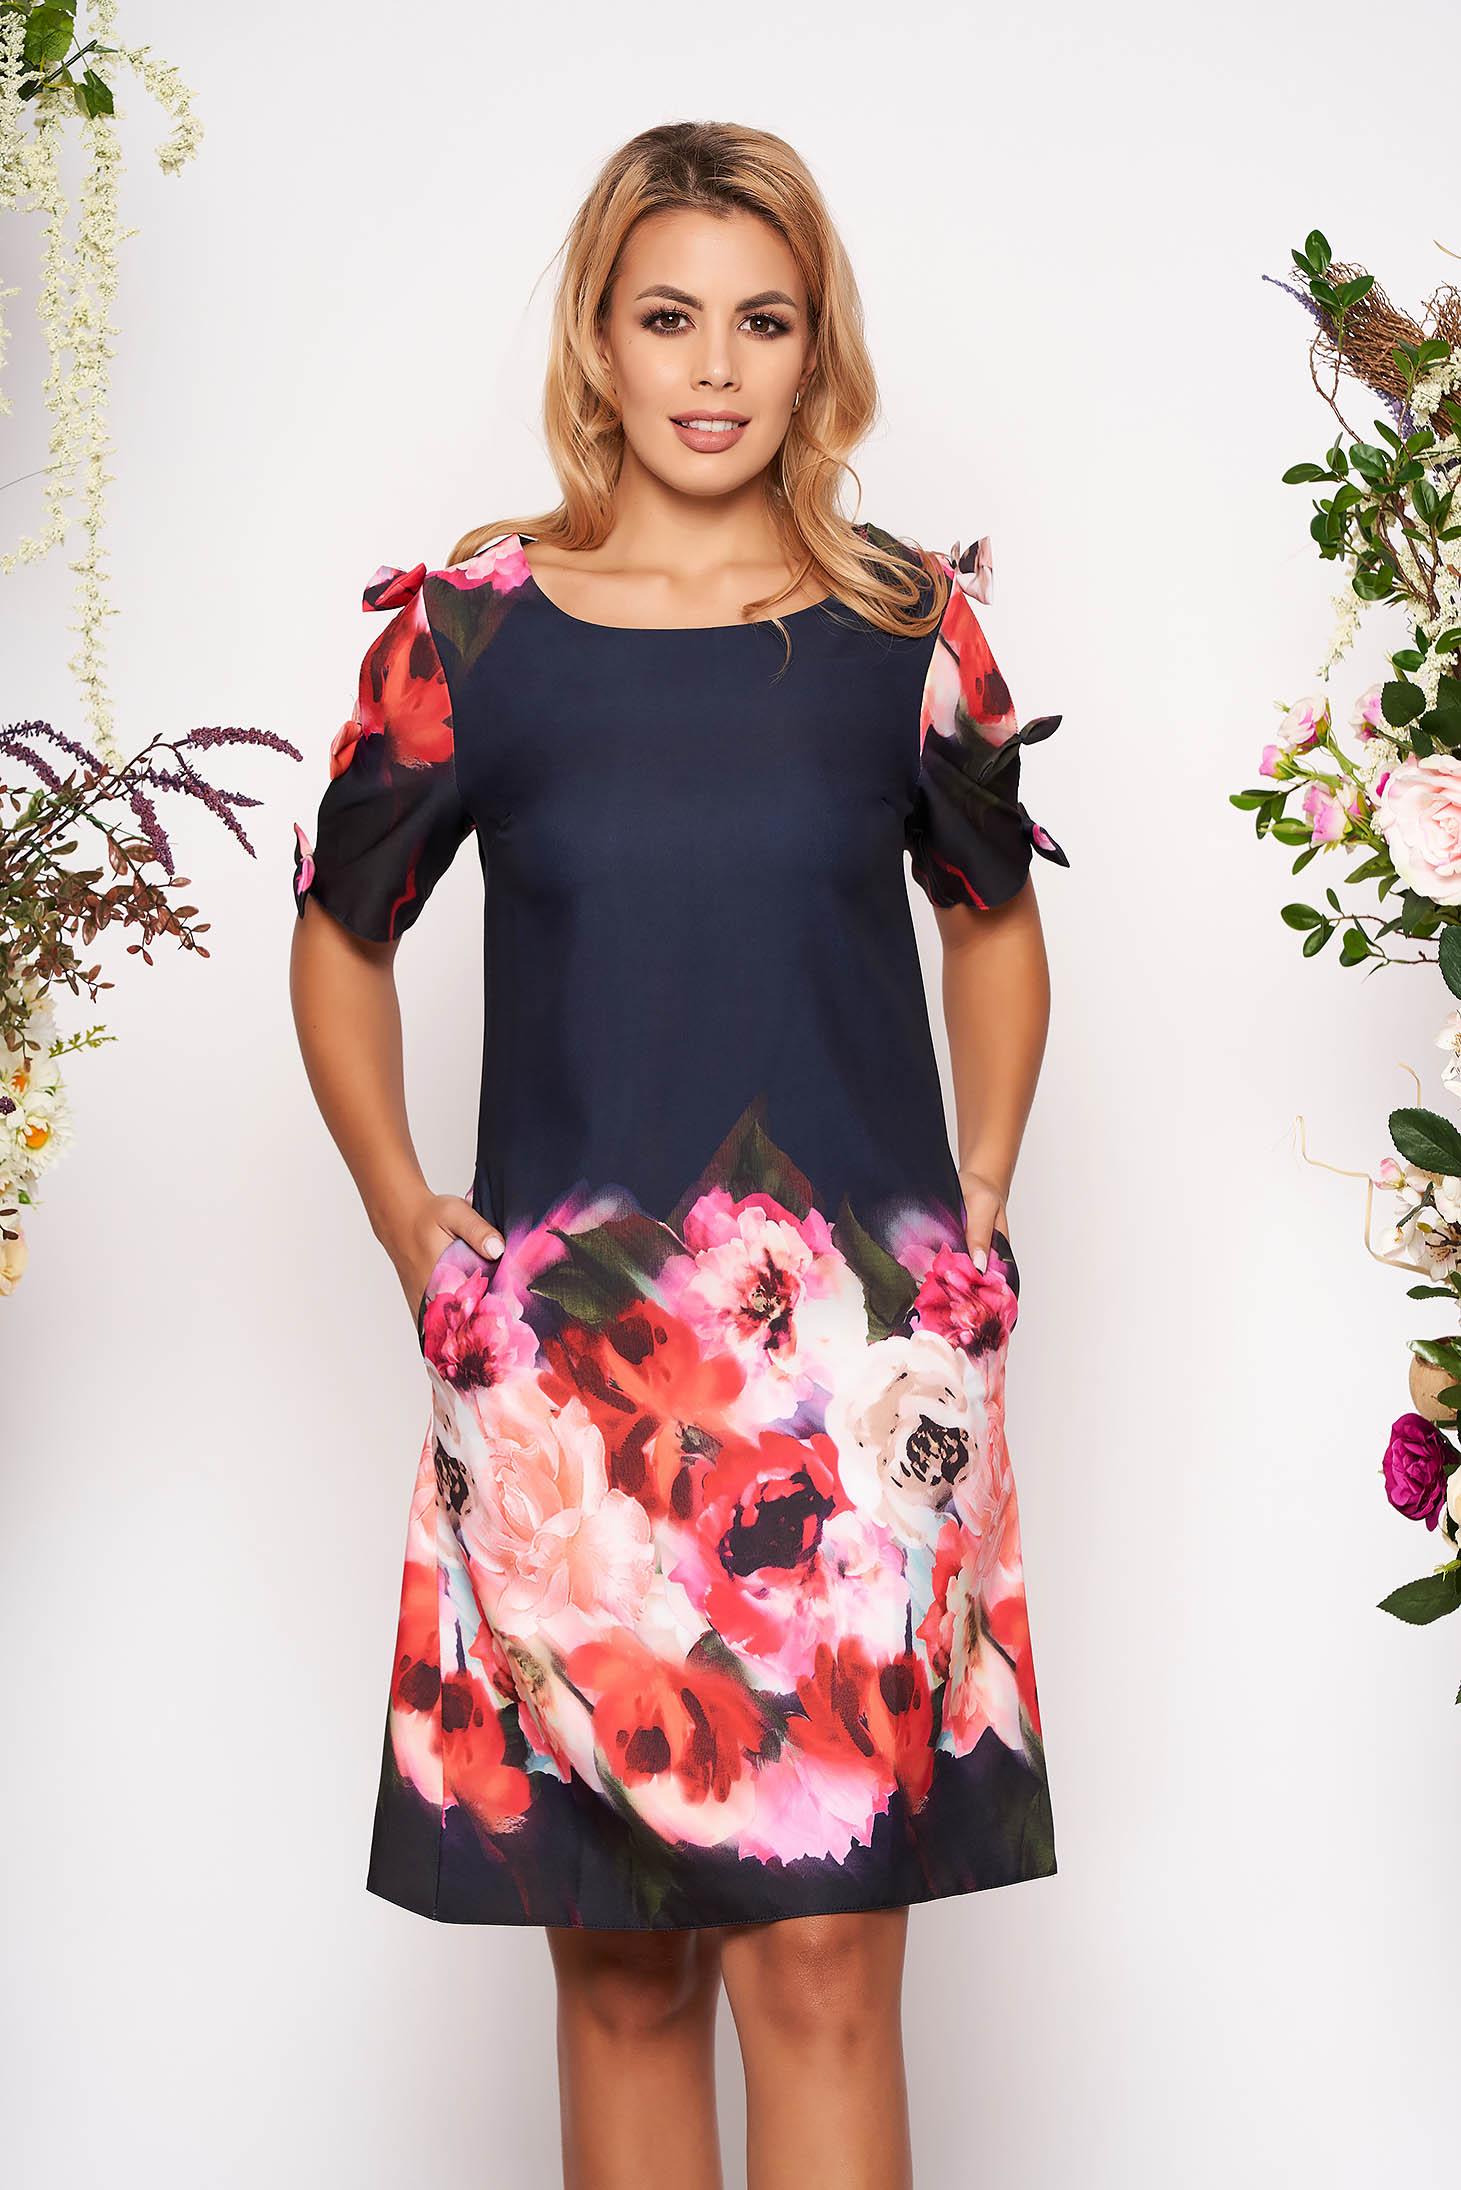 Rochie albastru-inchis scurta de zi din scuba cu croi larg cu buzunare cu decolteu rotunjit si imprimeu floral